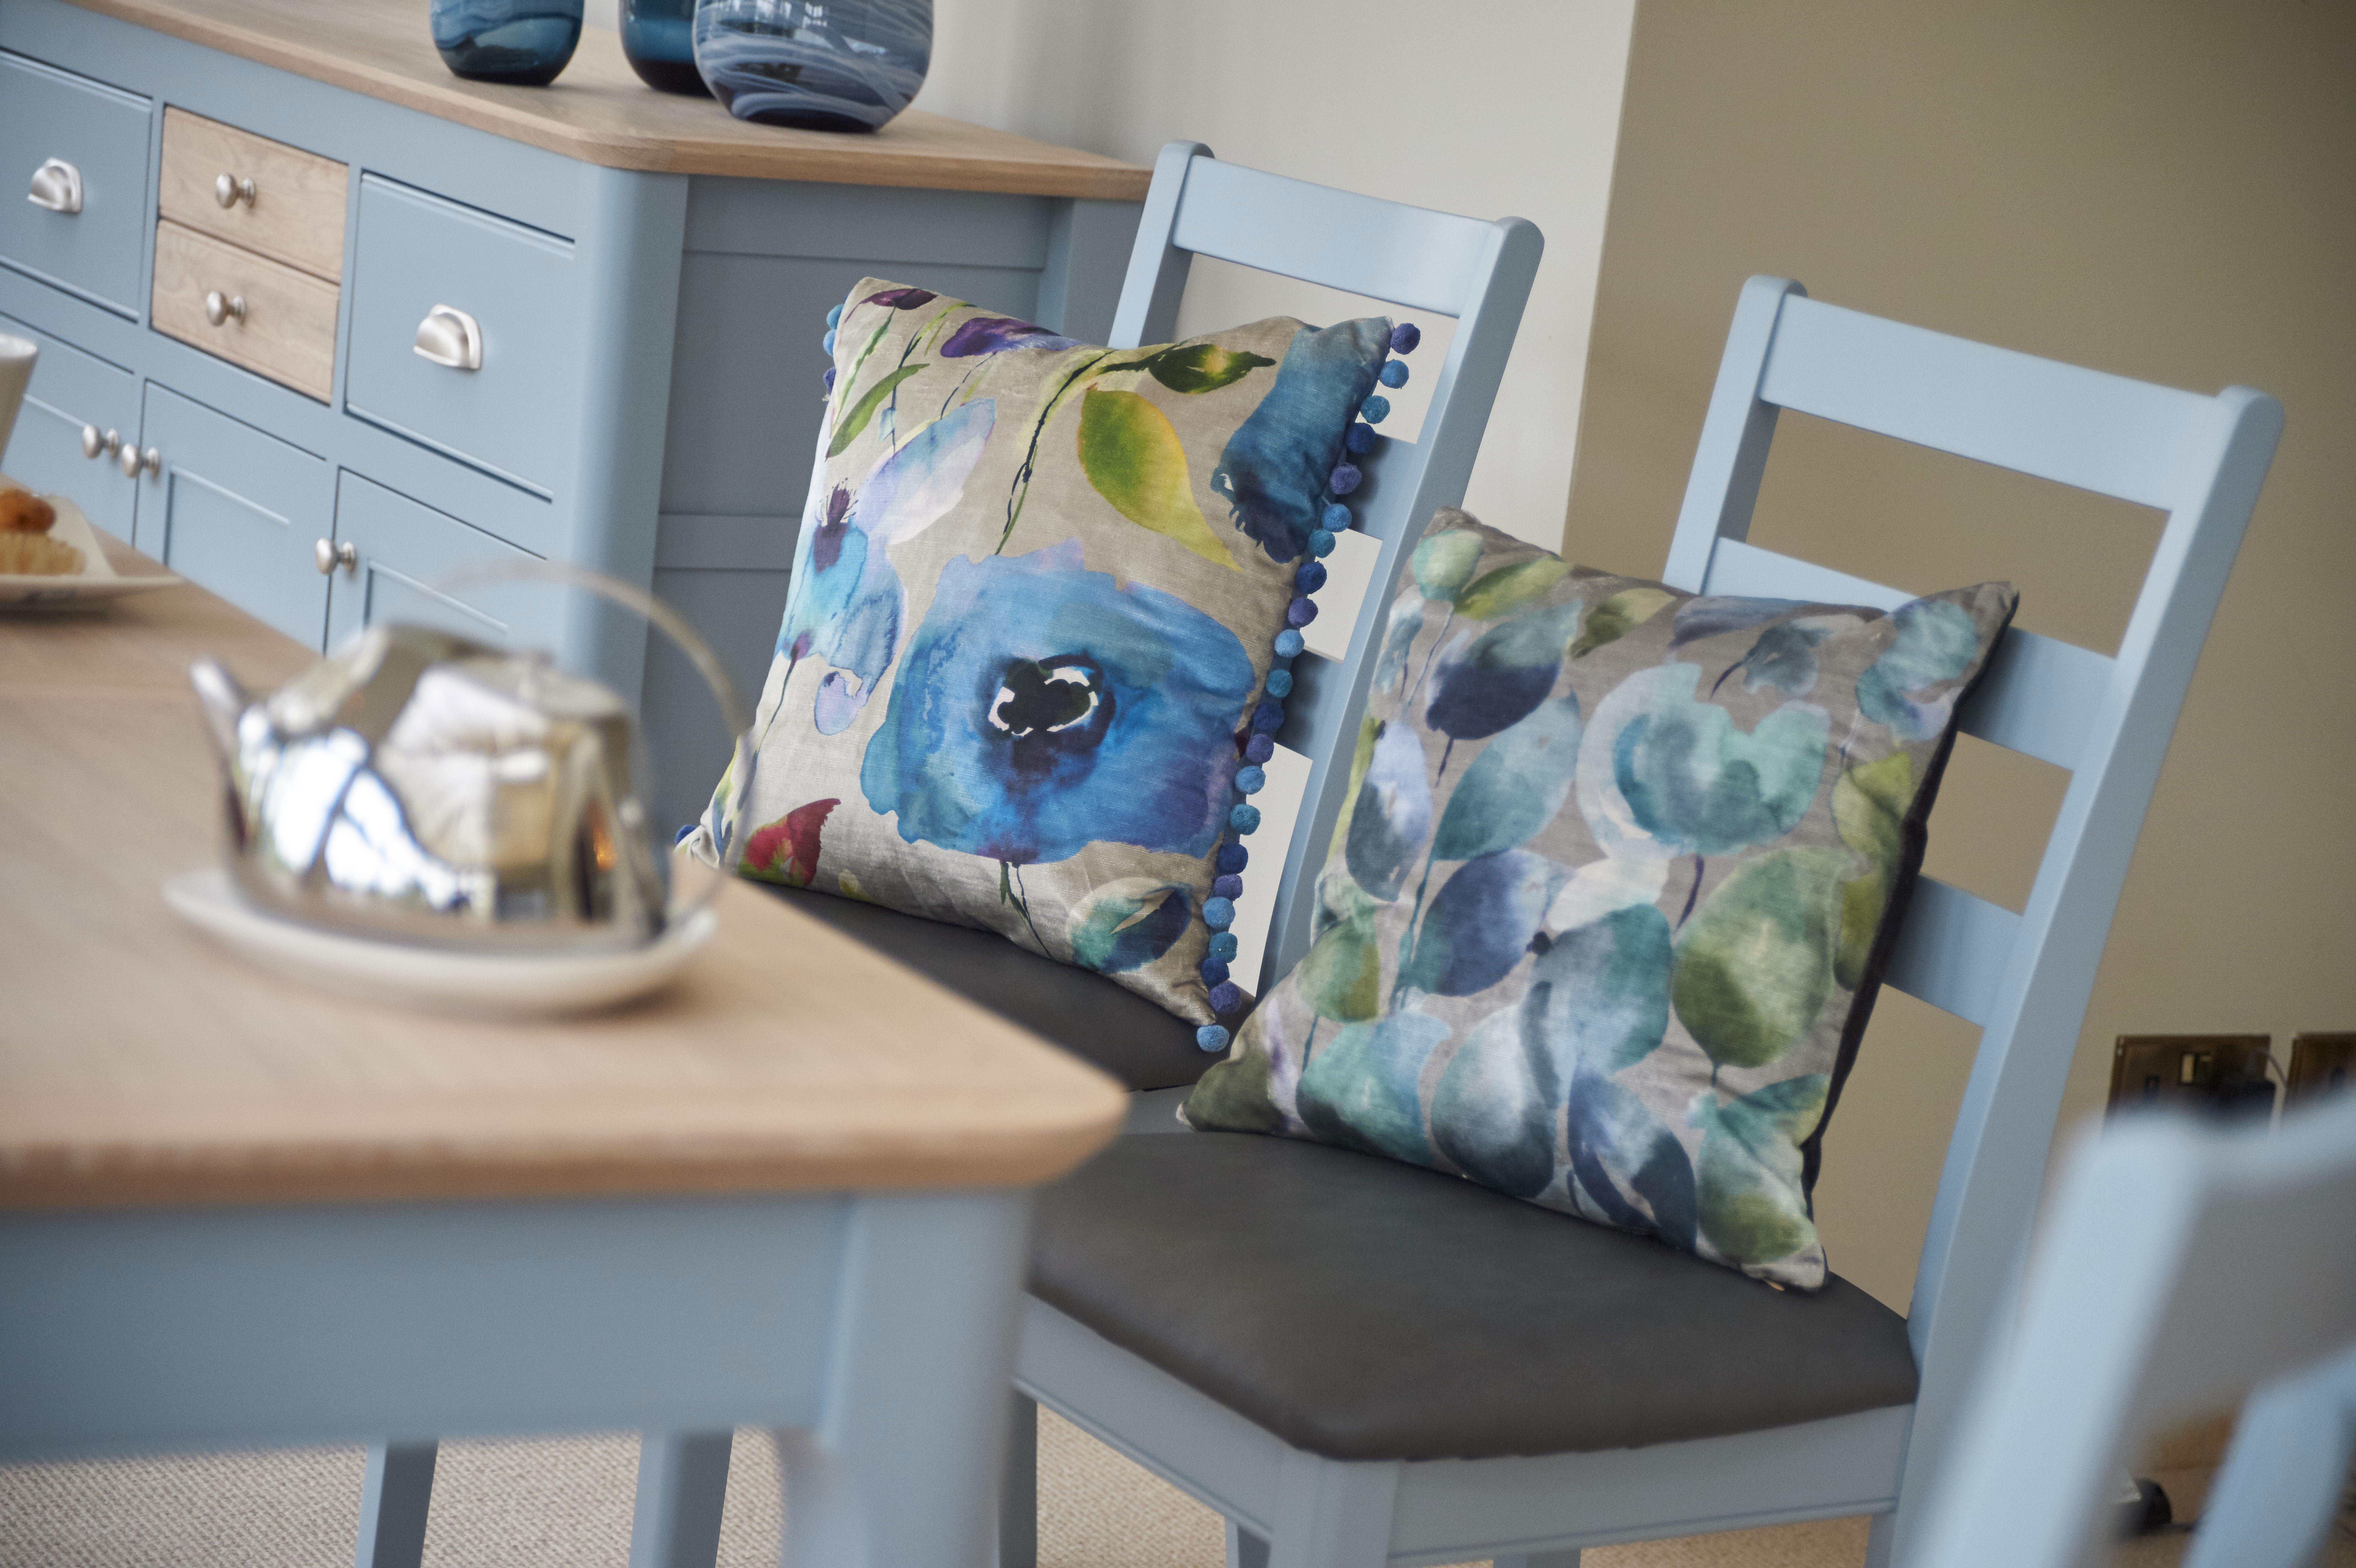 Utimate Christmas Gift Guide from Bridgman's | Home Decor  | Elle Blonde Luxury Lifestyle Destination Blog